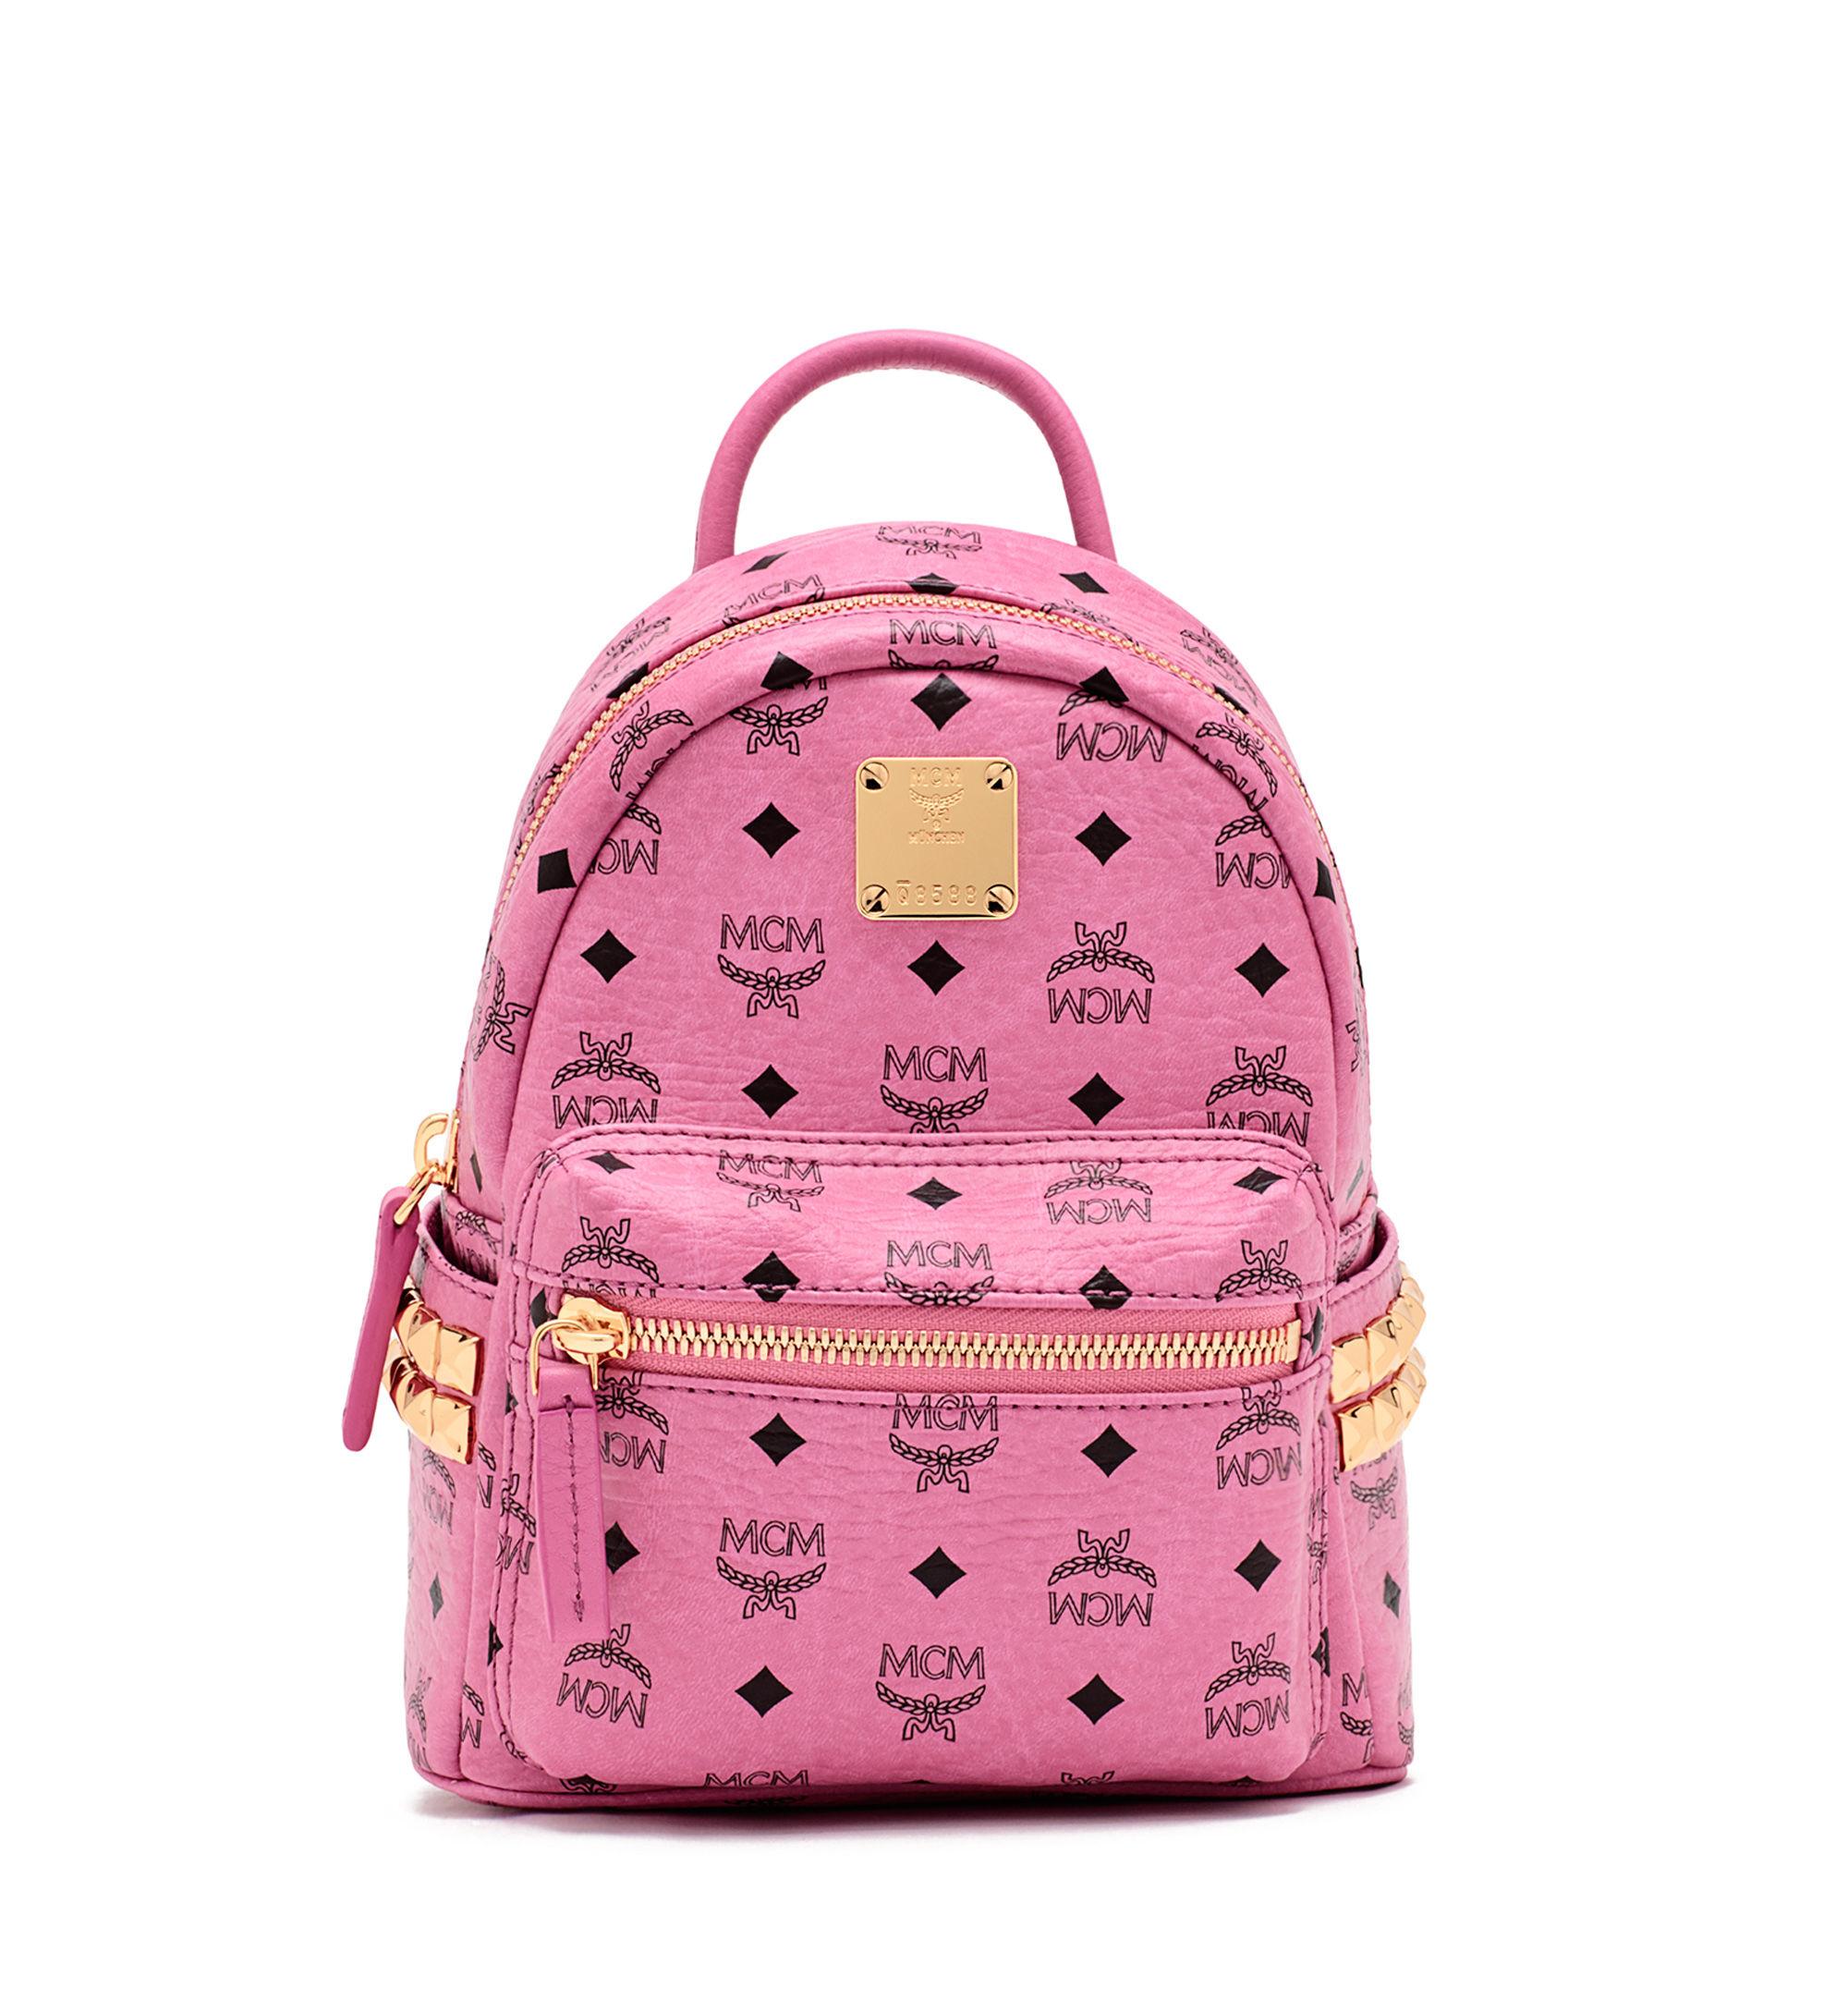 Mcm Stark Sprinkle Stud Medium Coated Canvas Backpack in ...